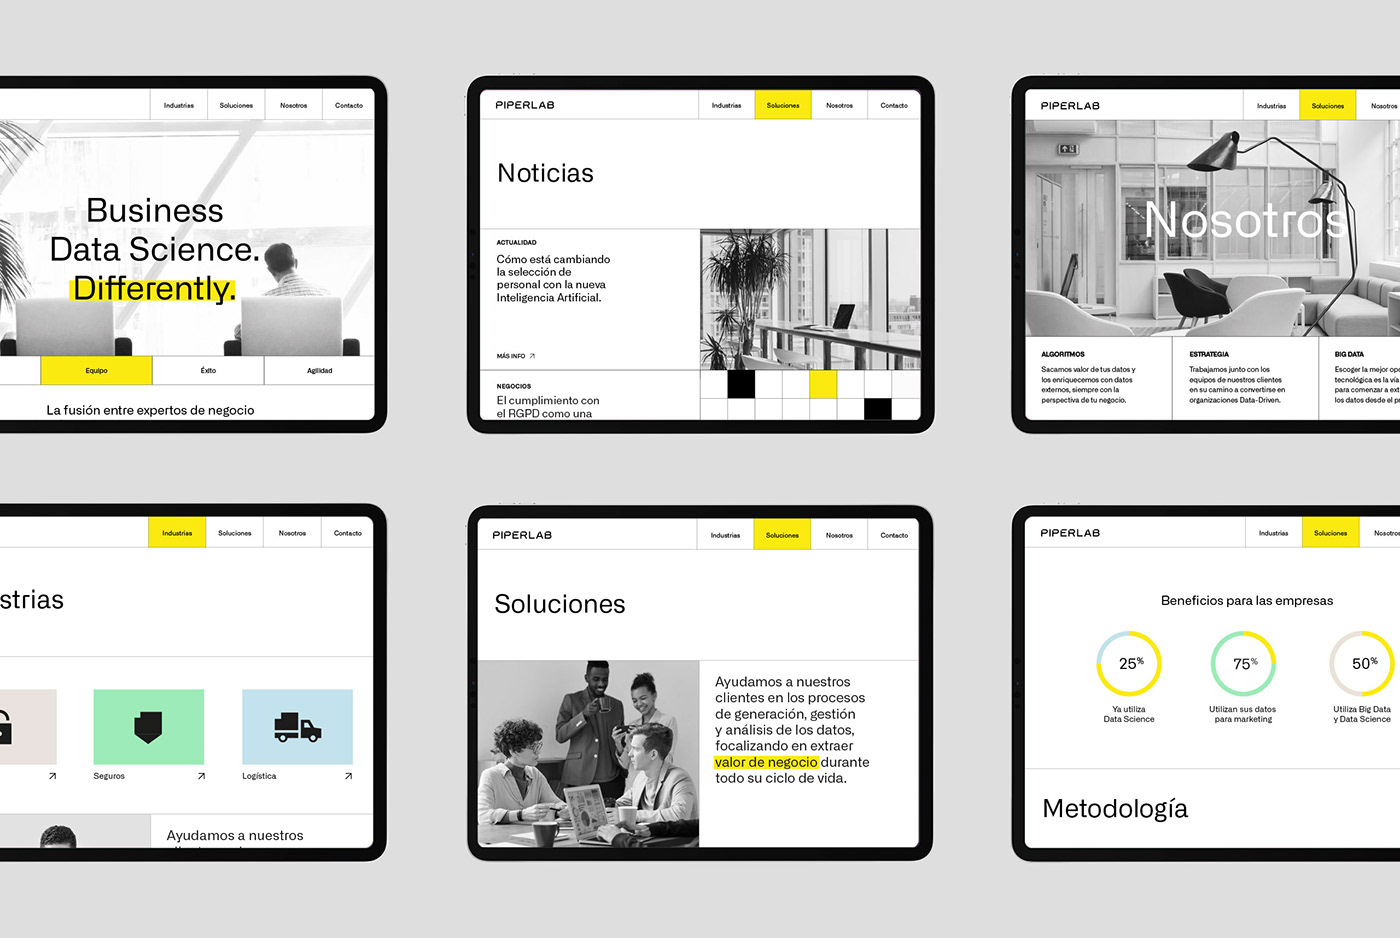 brand branding  business Data science